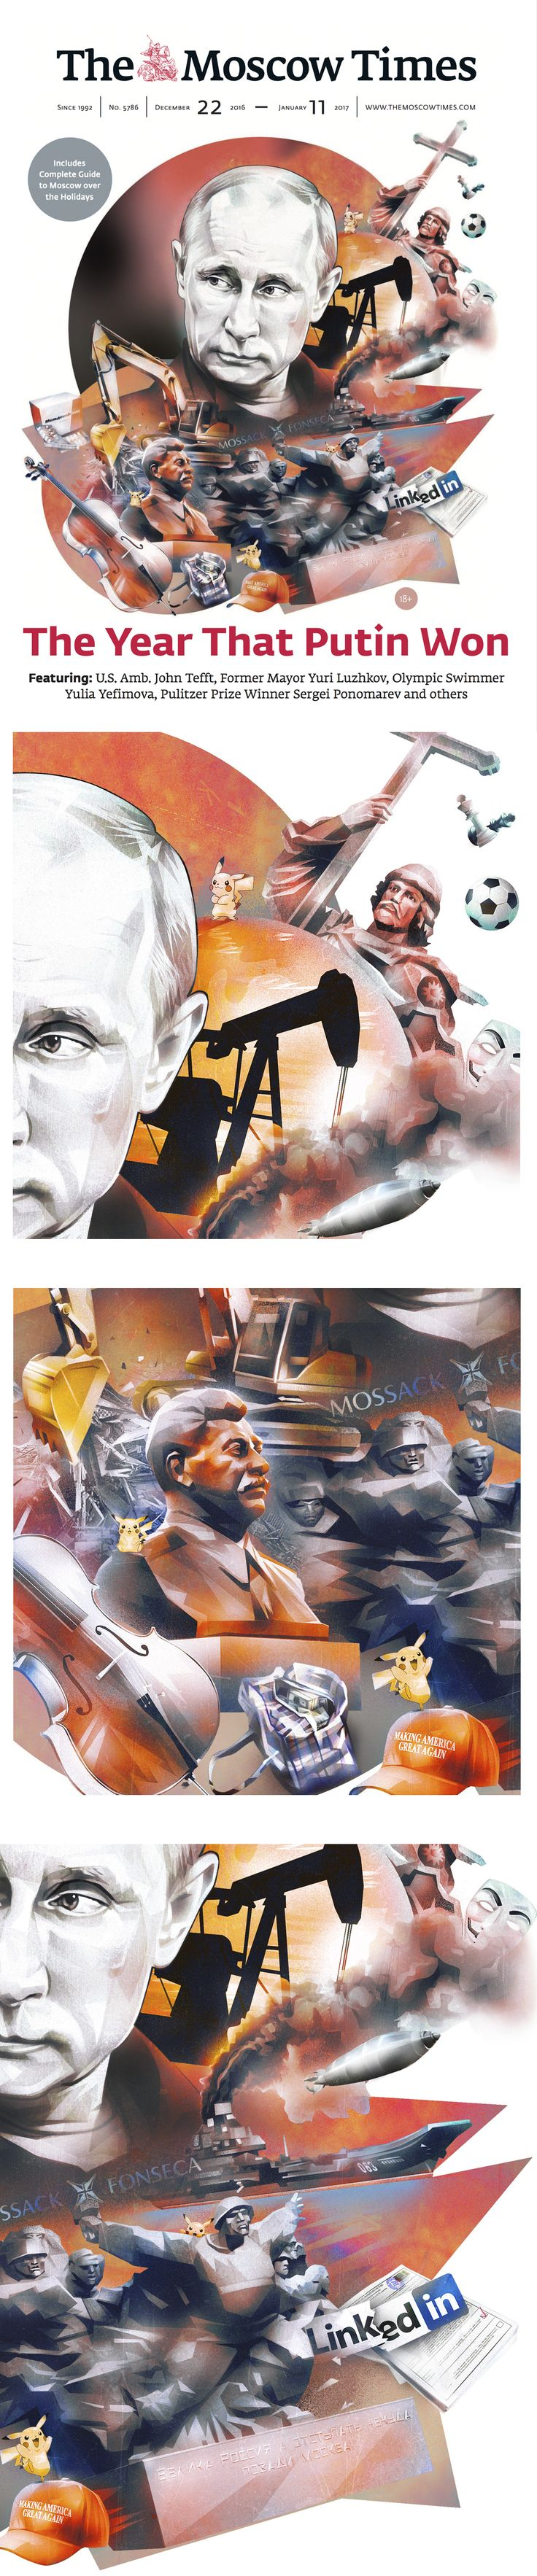 The Year of Putin, Иллюстрация © ГаляГубченко